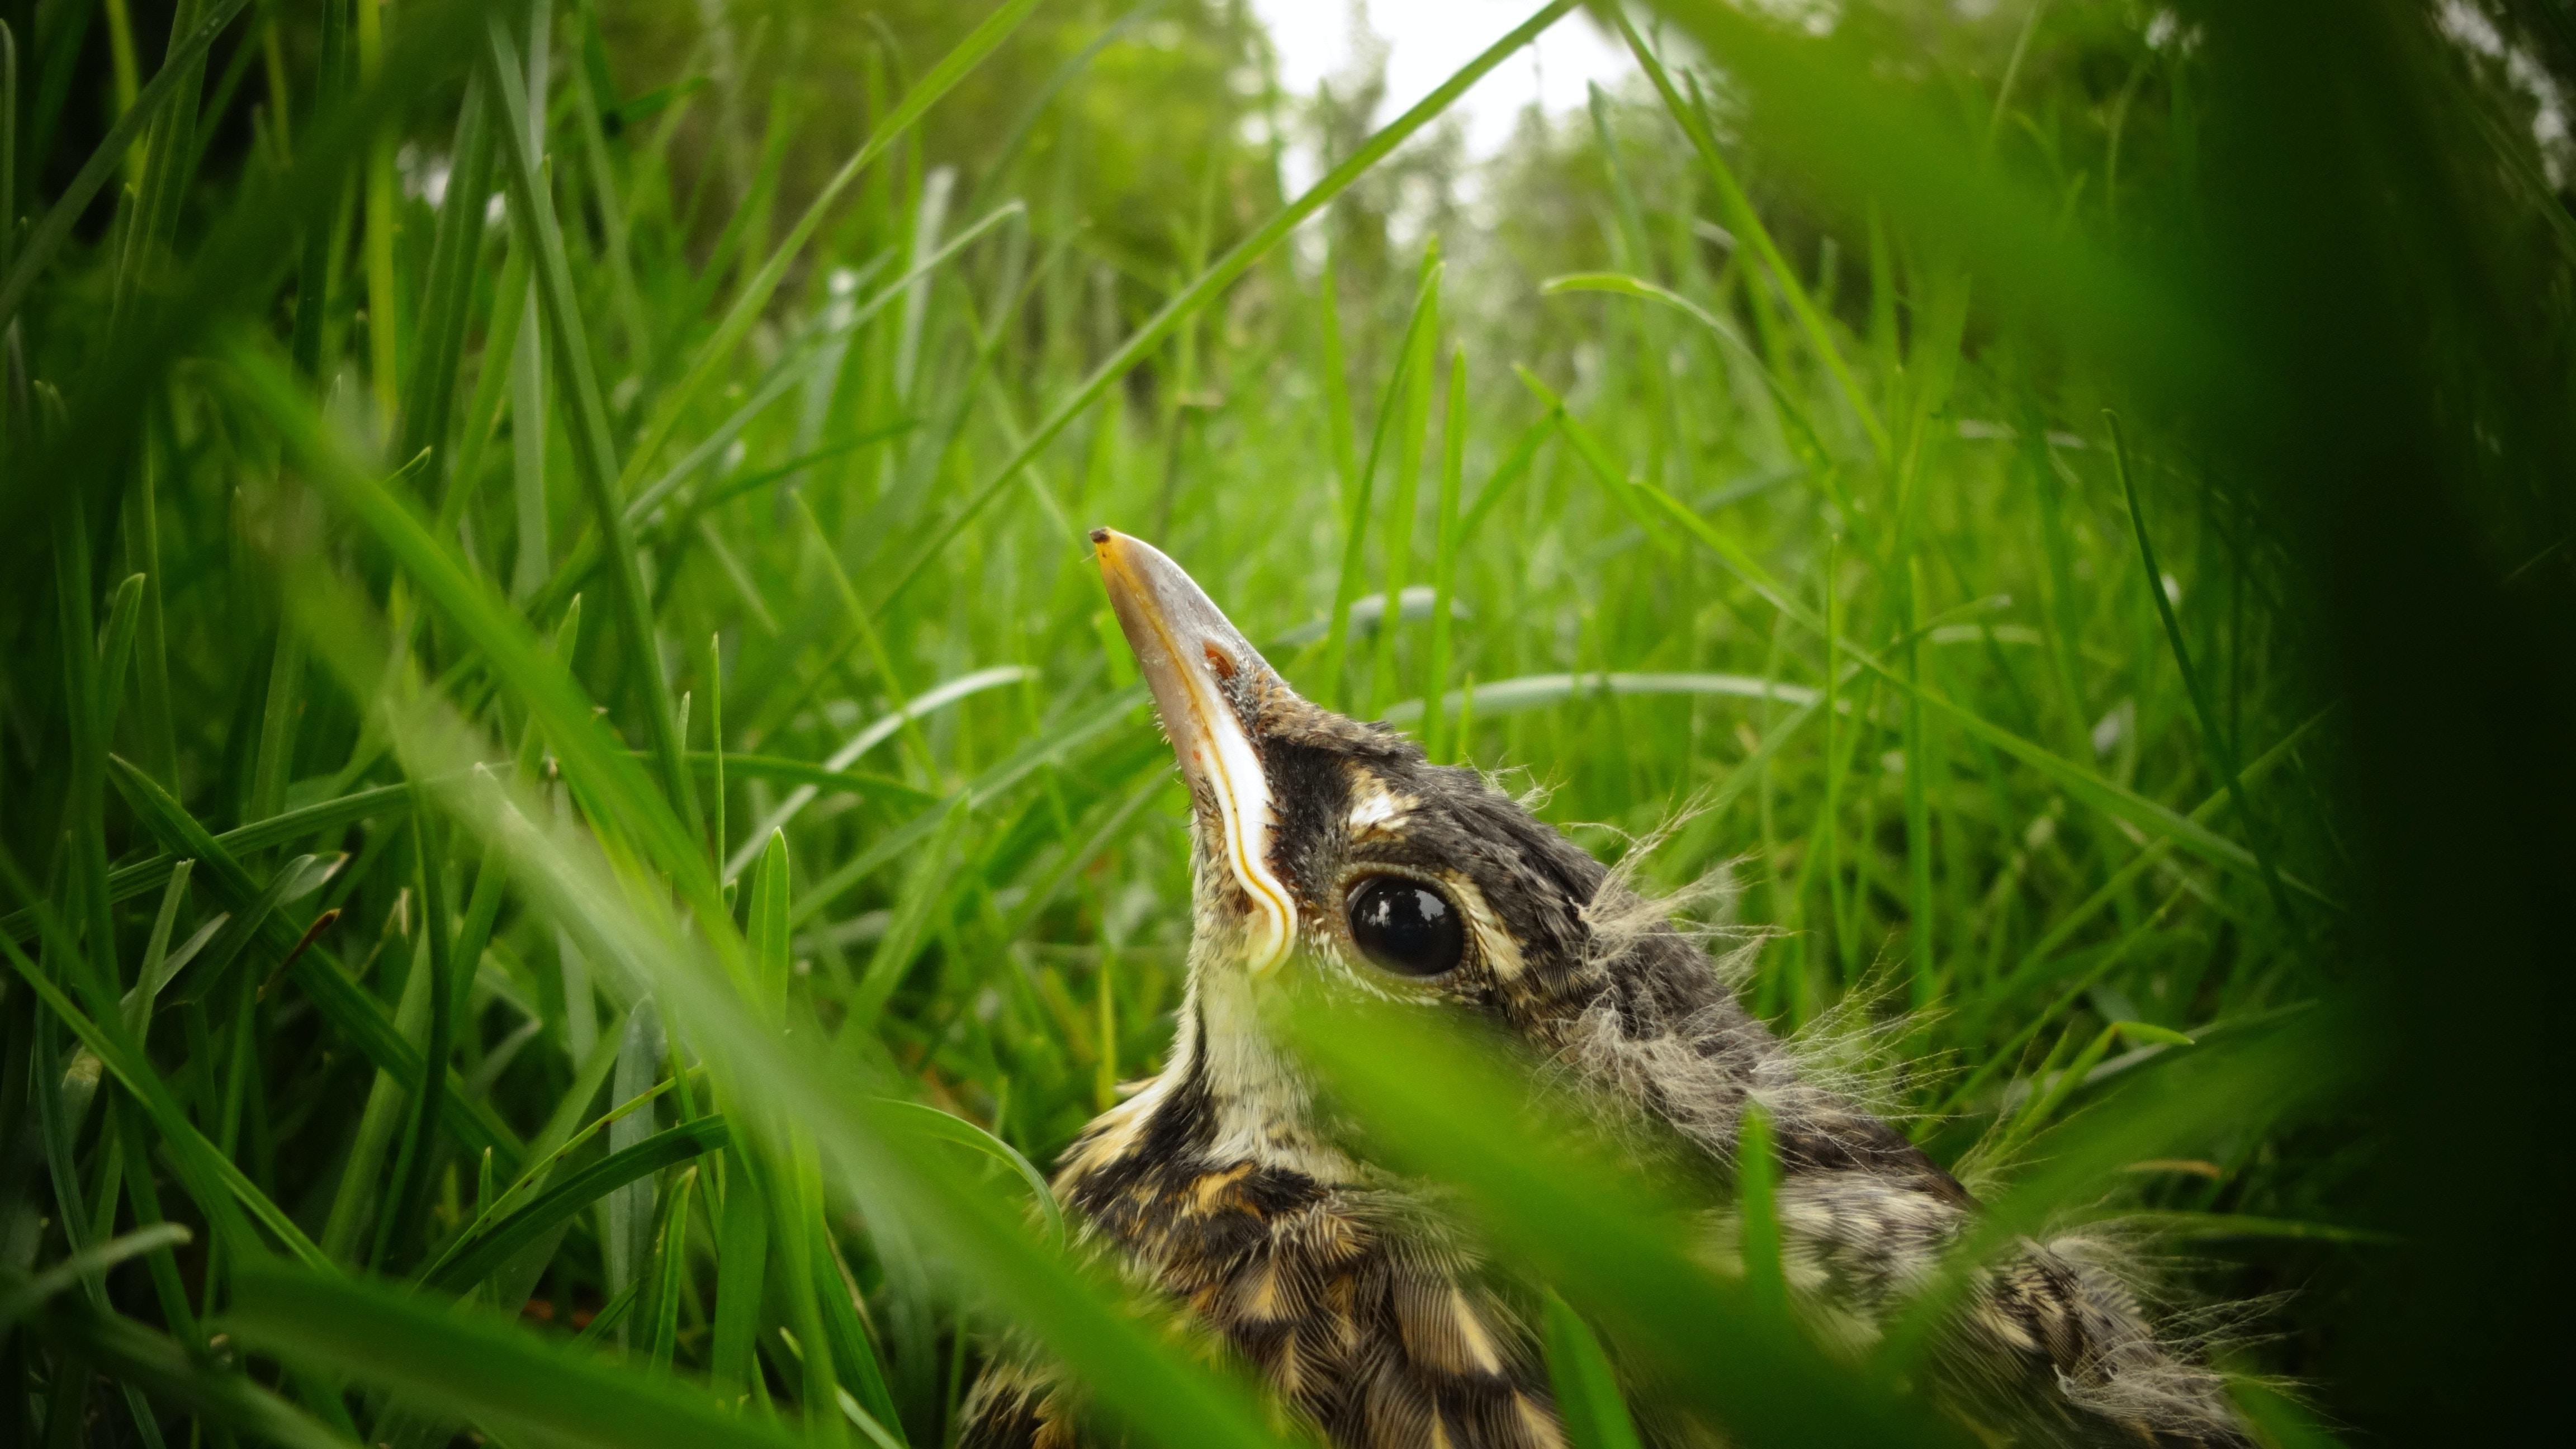 closeup photography of gray bird on green grass at daytime